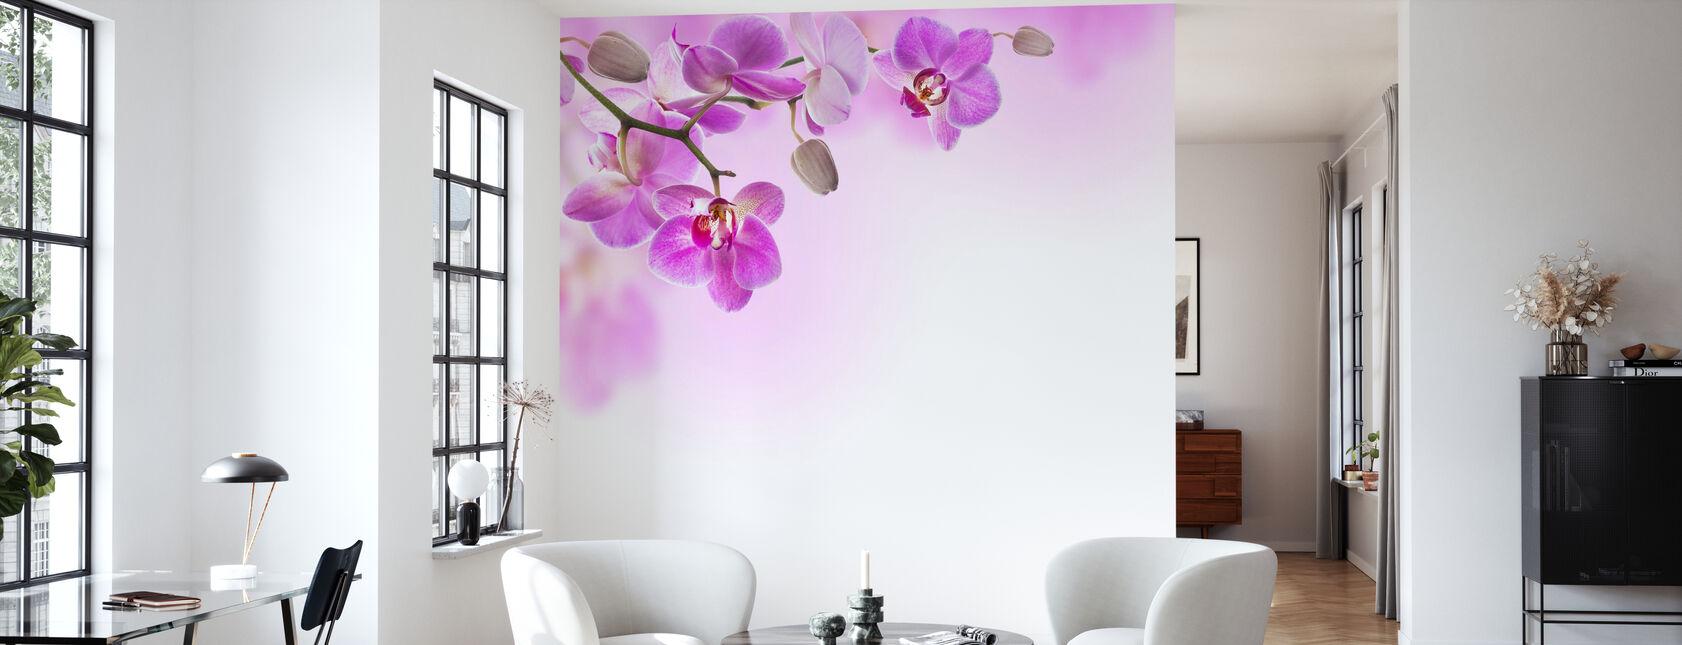 Tropical Fuchsia Orchids - Wallpaper - Living Room